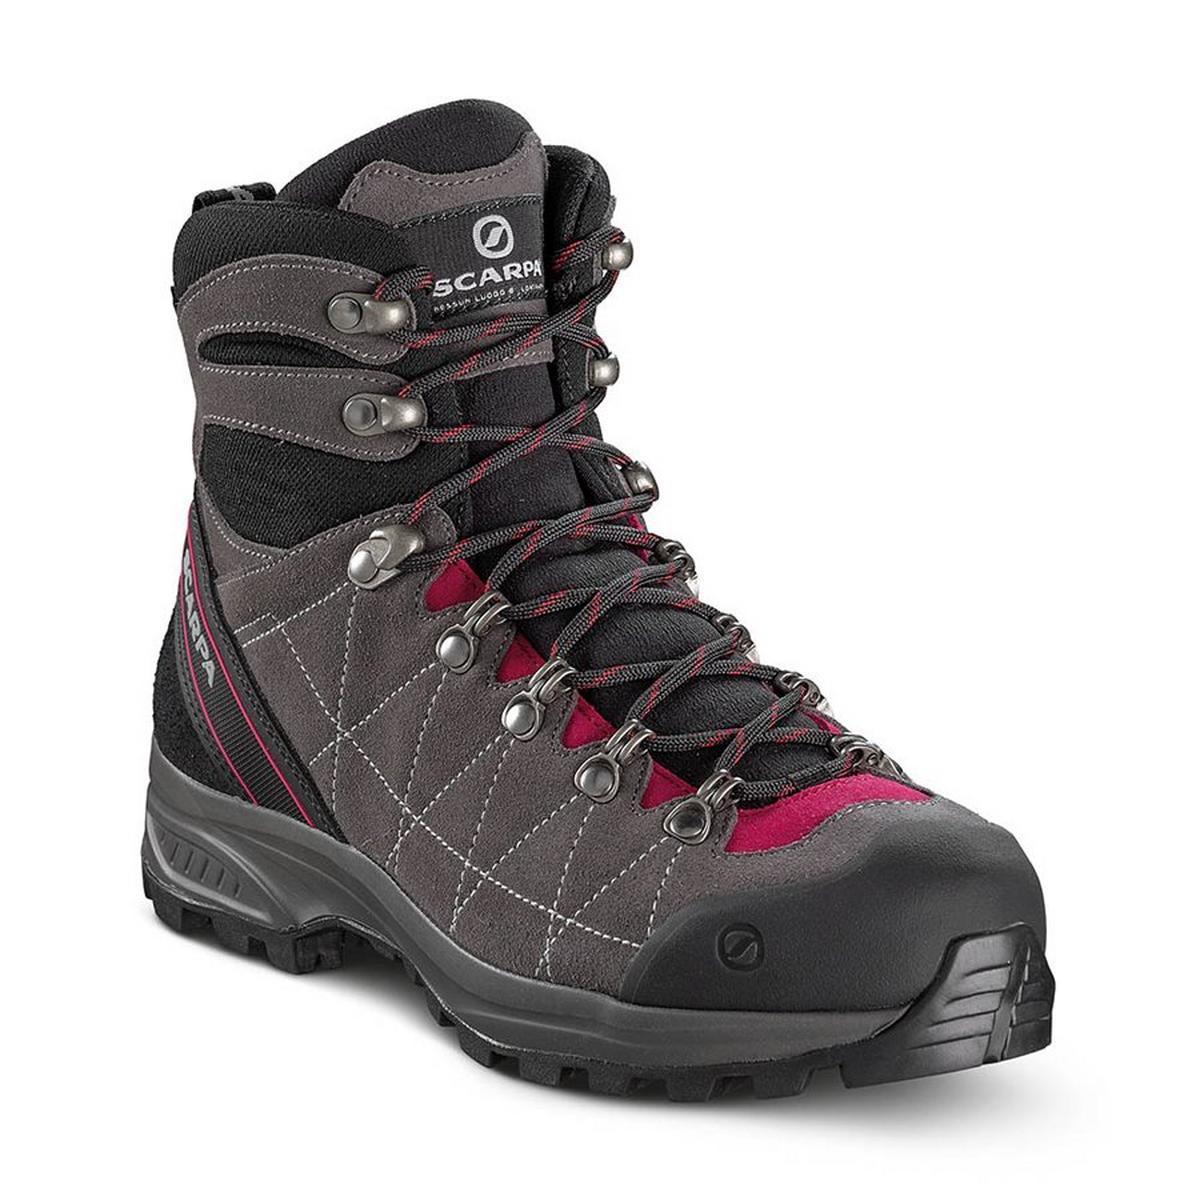 Scarpa Boots Women's R-Evo GTX Titanium/Cherry